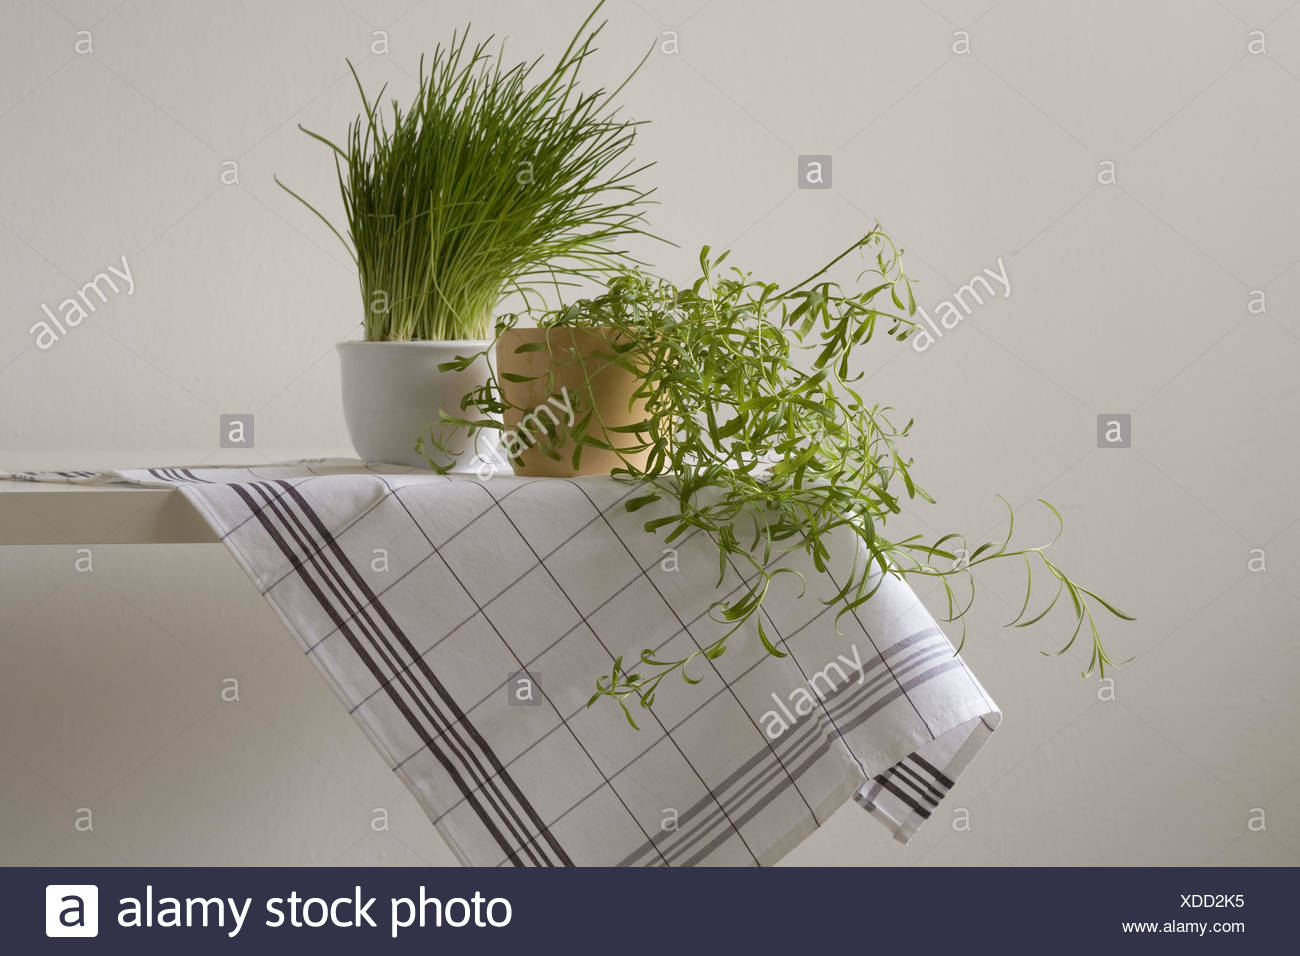 Küchentisch, Tuch, Blumentöpfe, Kräuter, Stockbild